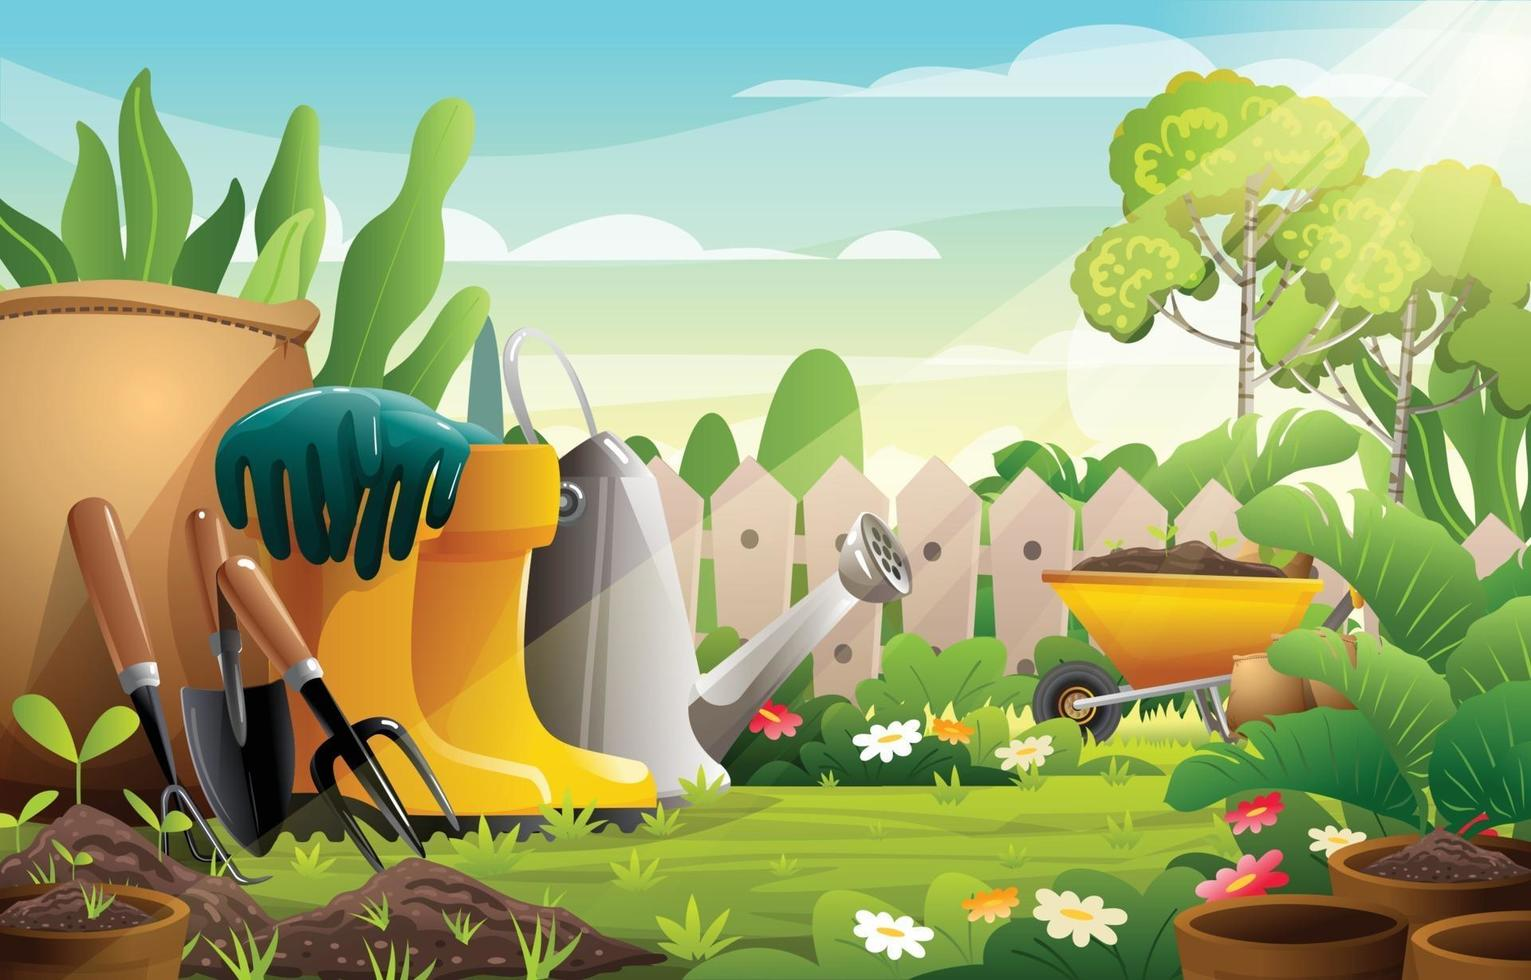 Garden with Gardening Tools Background Concept vector